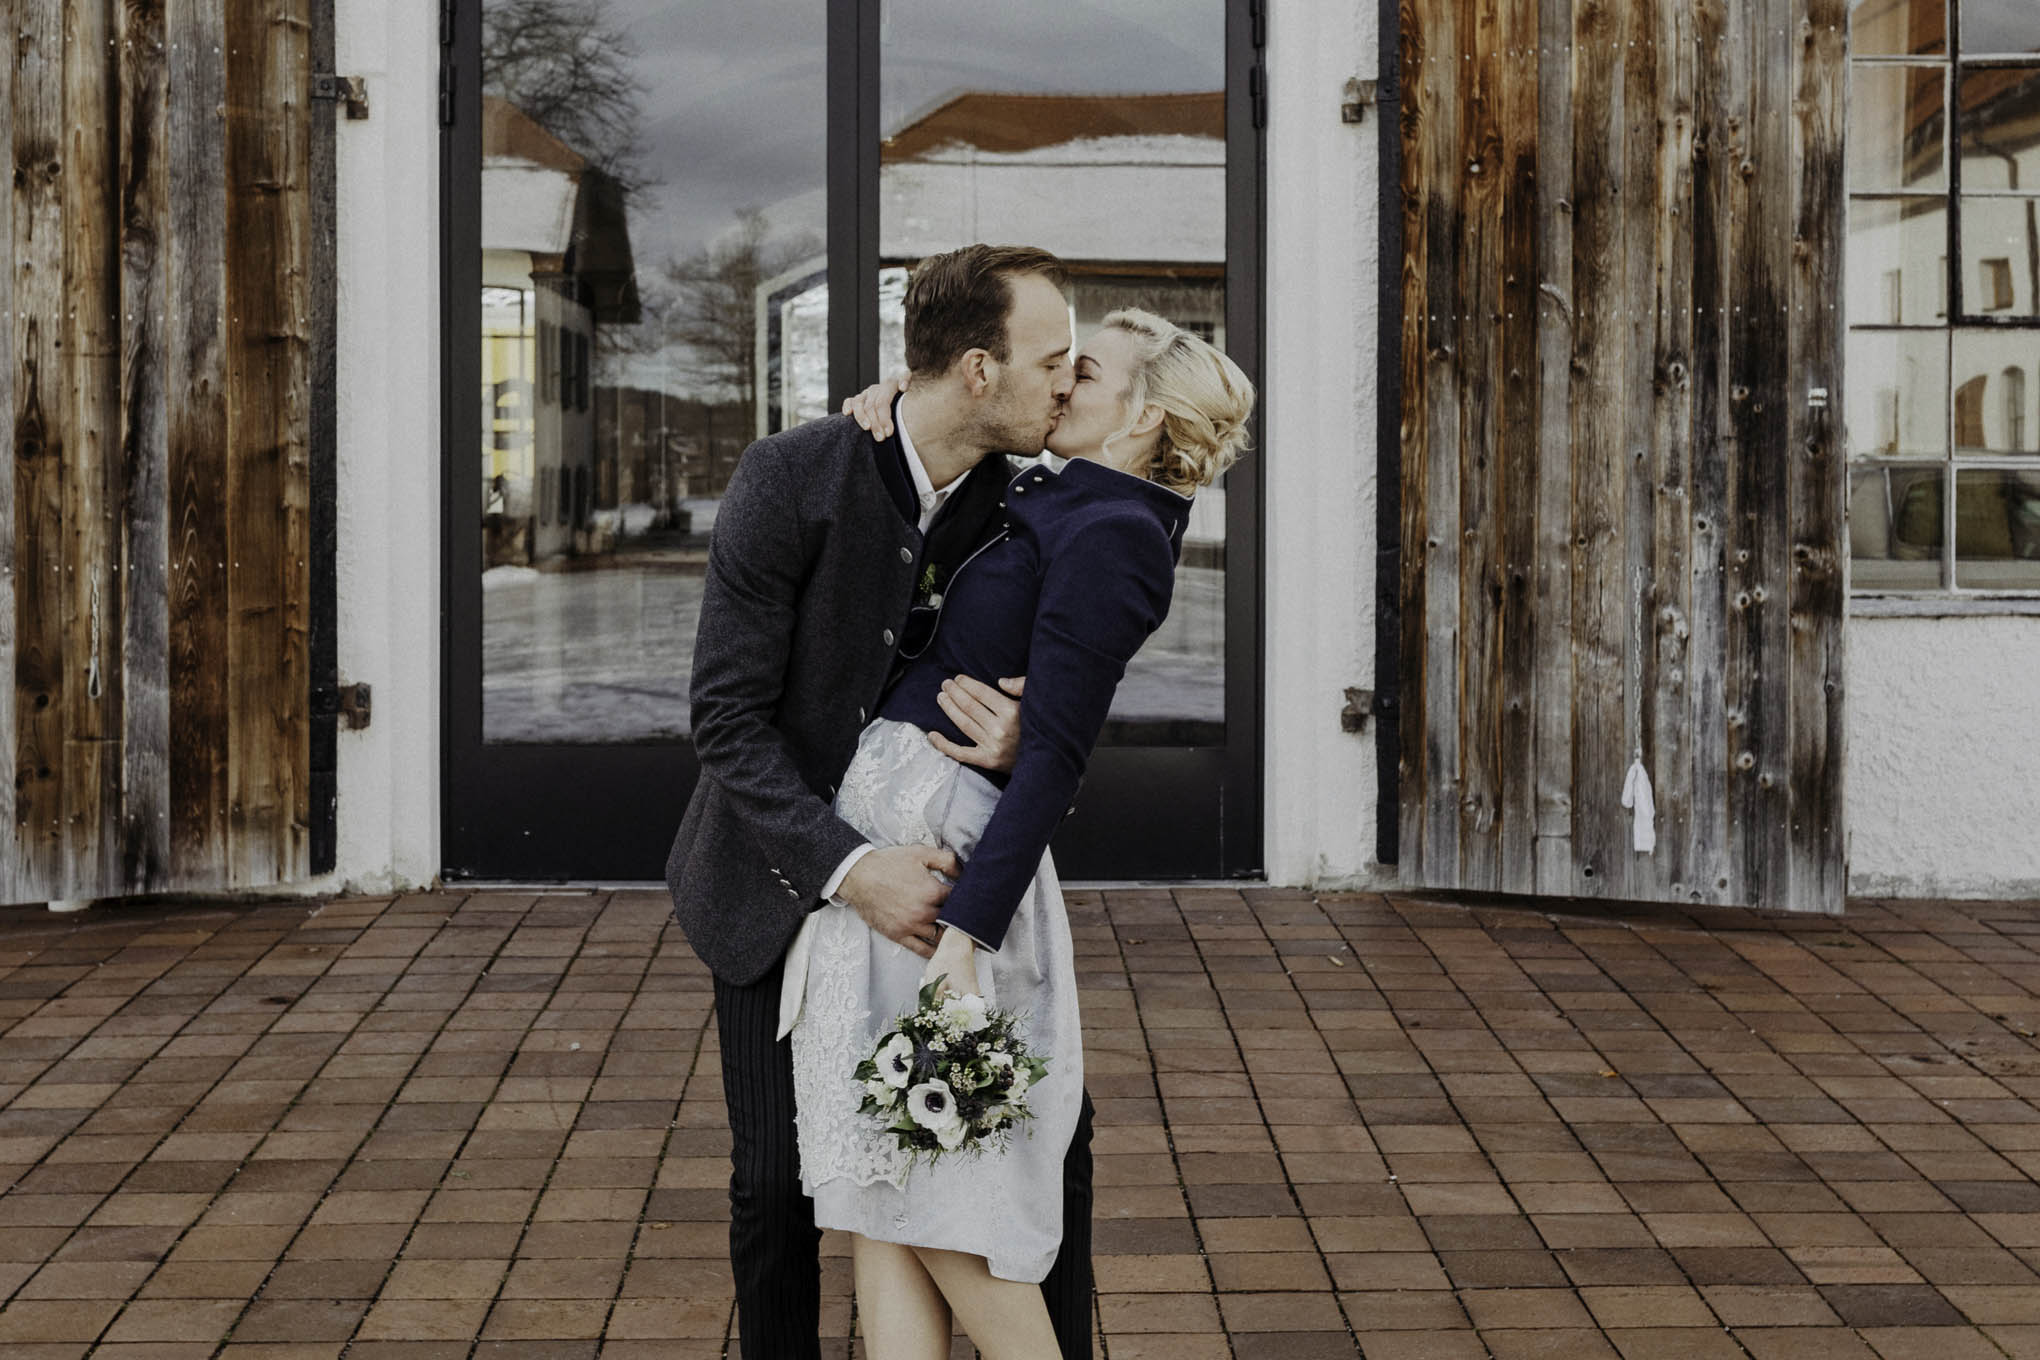 Hochzeitsfotos am Gut Kaltenbrunn Tegernsee